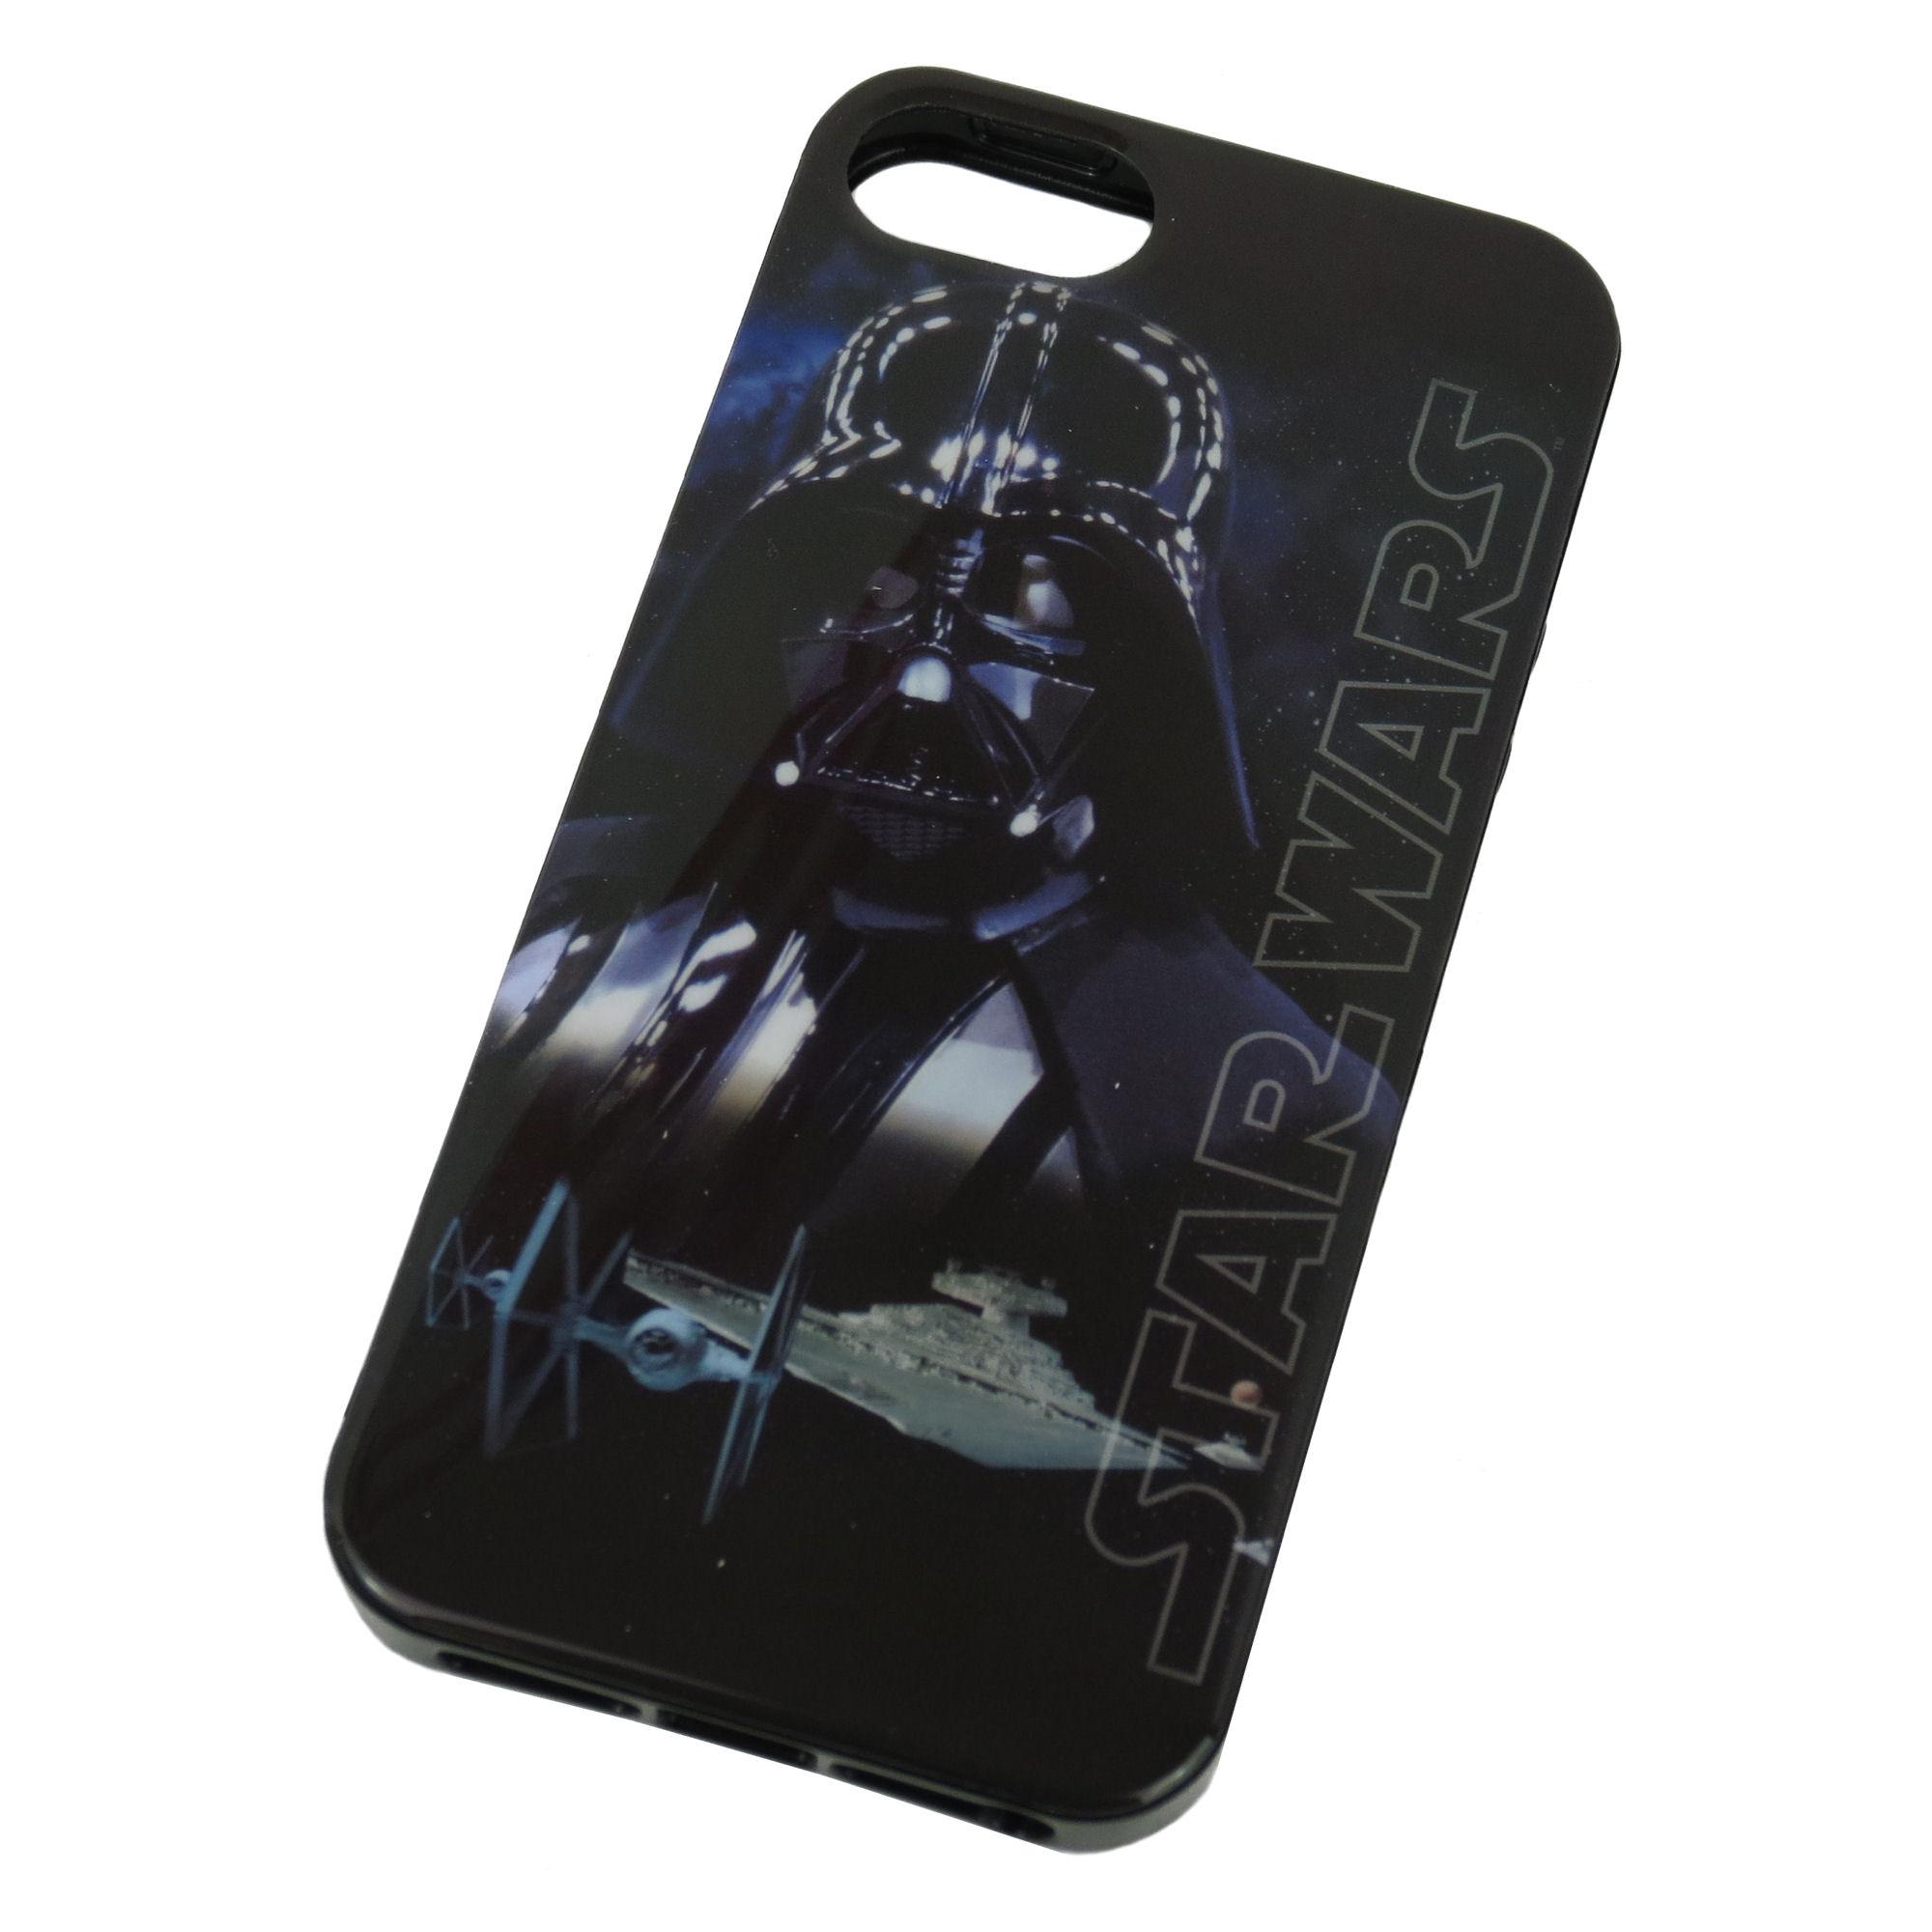 DARTH VADER IPHONE 5 5S HARD CASE RETRO STAR WARS COVER ...